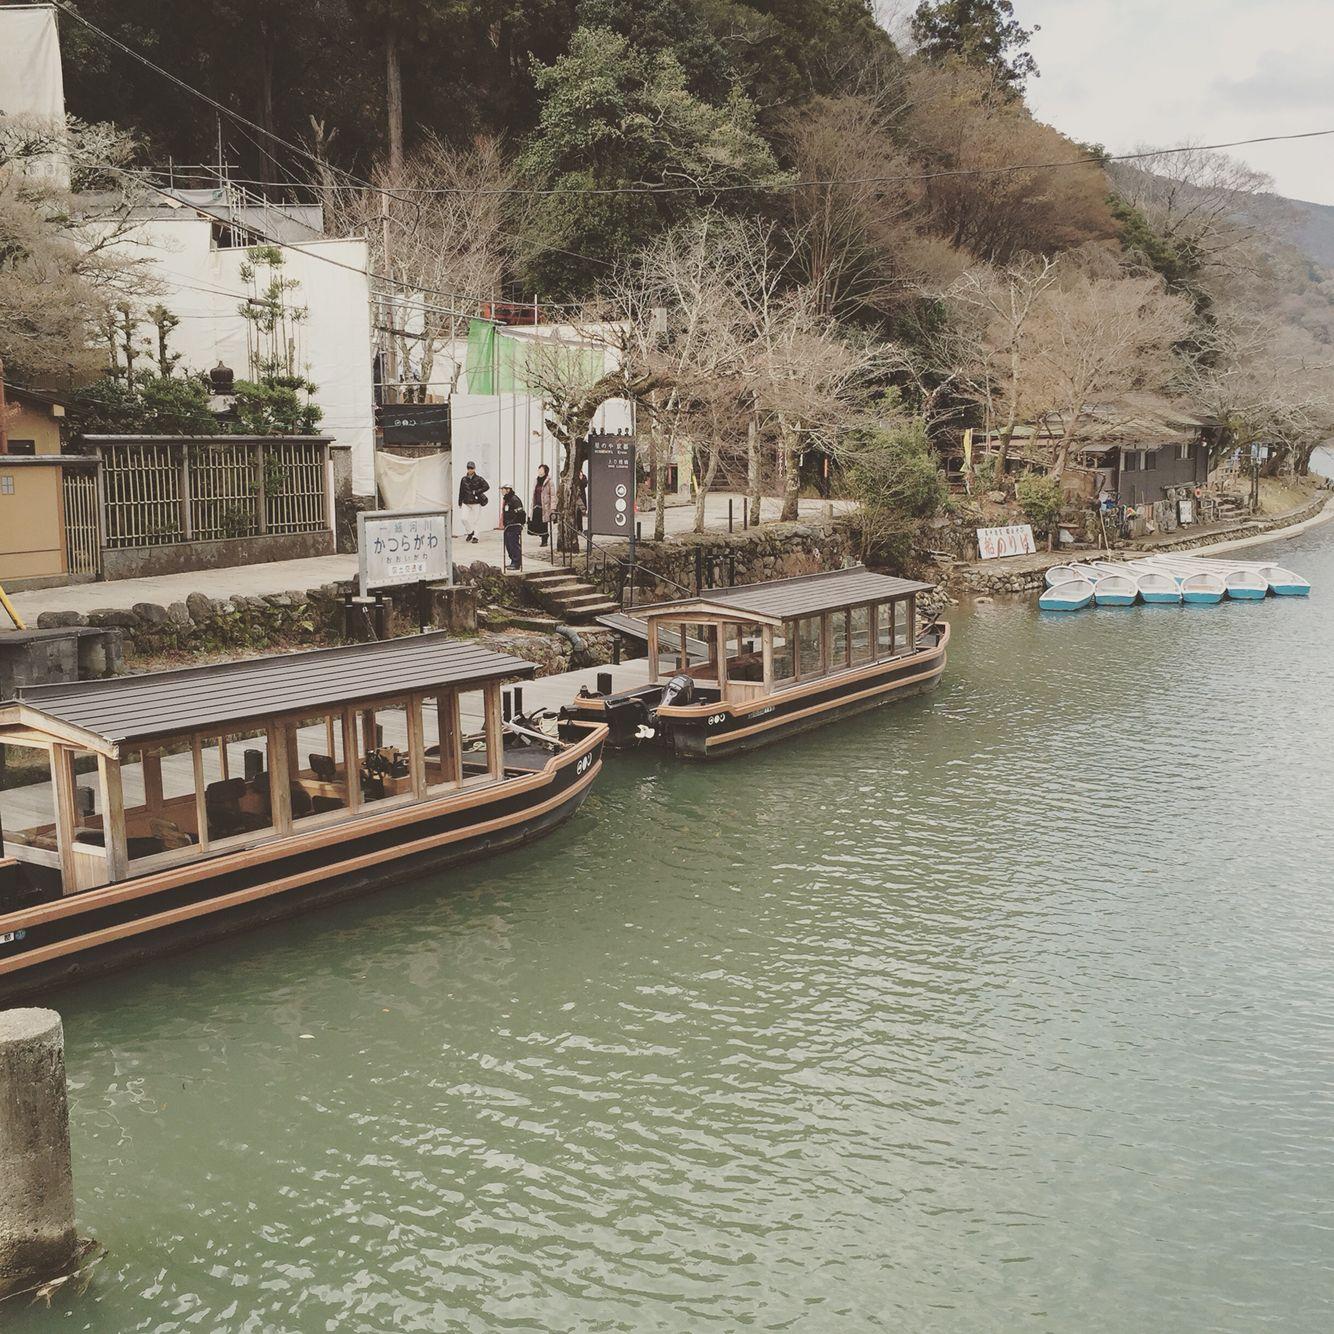 Togetsukyo Bridge, Arashiyama, Japan Don't forget to do the boat ride!